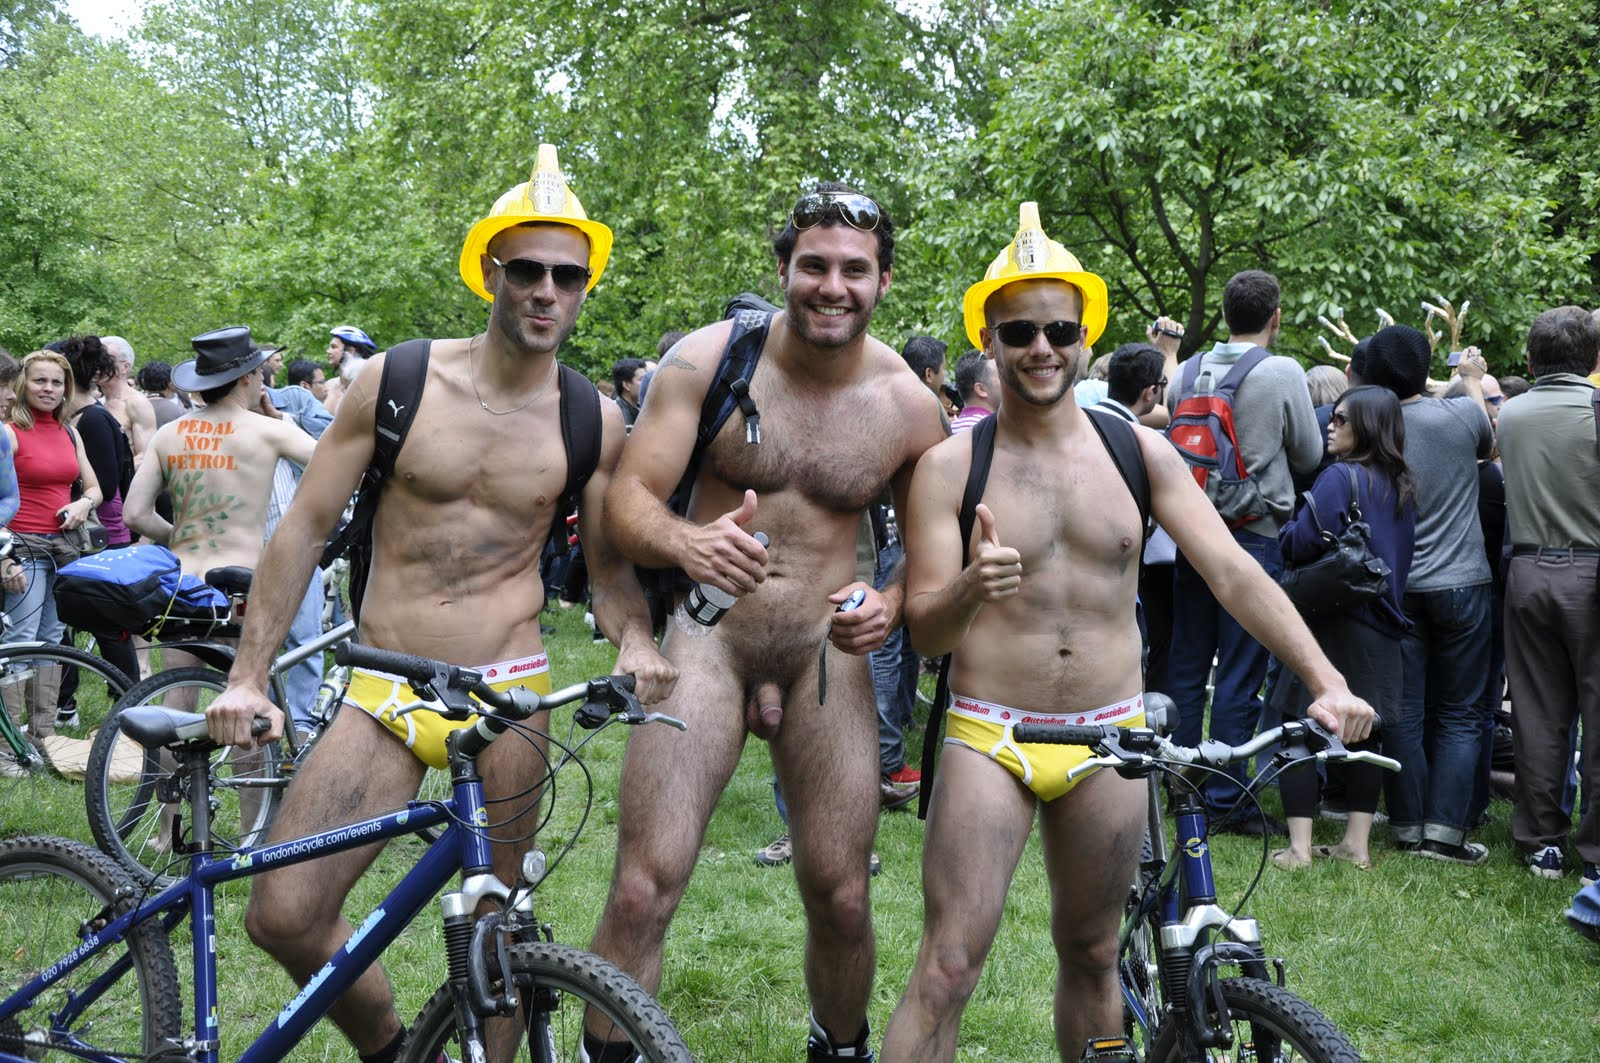 naked bike erected World Naked Bike Ride